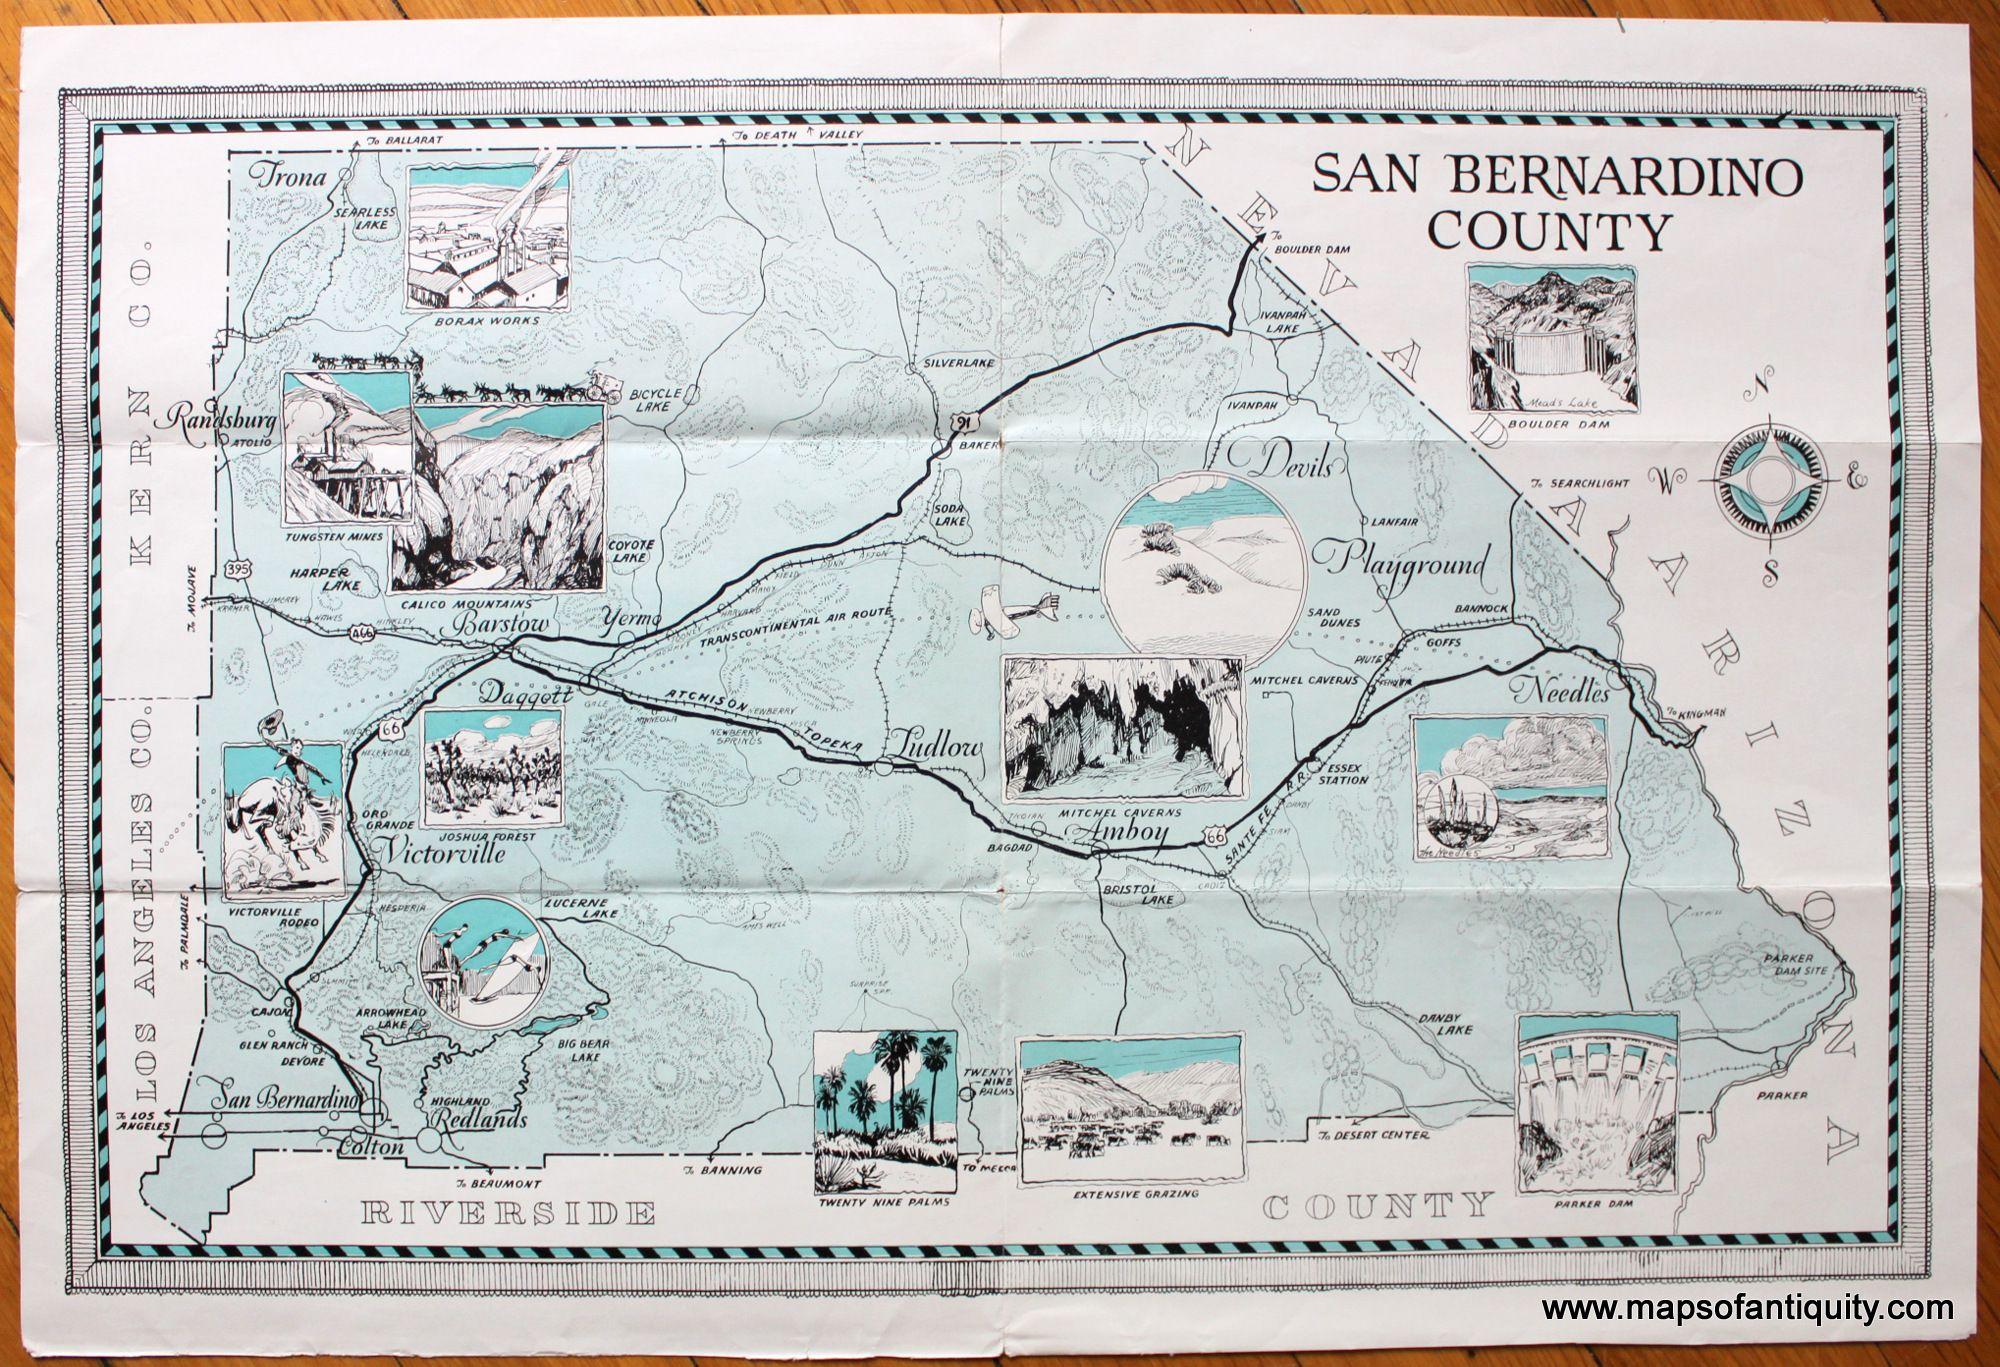 San Bernardino County Ca Antique Maps And Charts Original Vintage Rare Historical Prints Reproductions Of